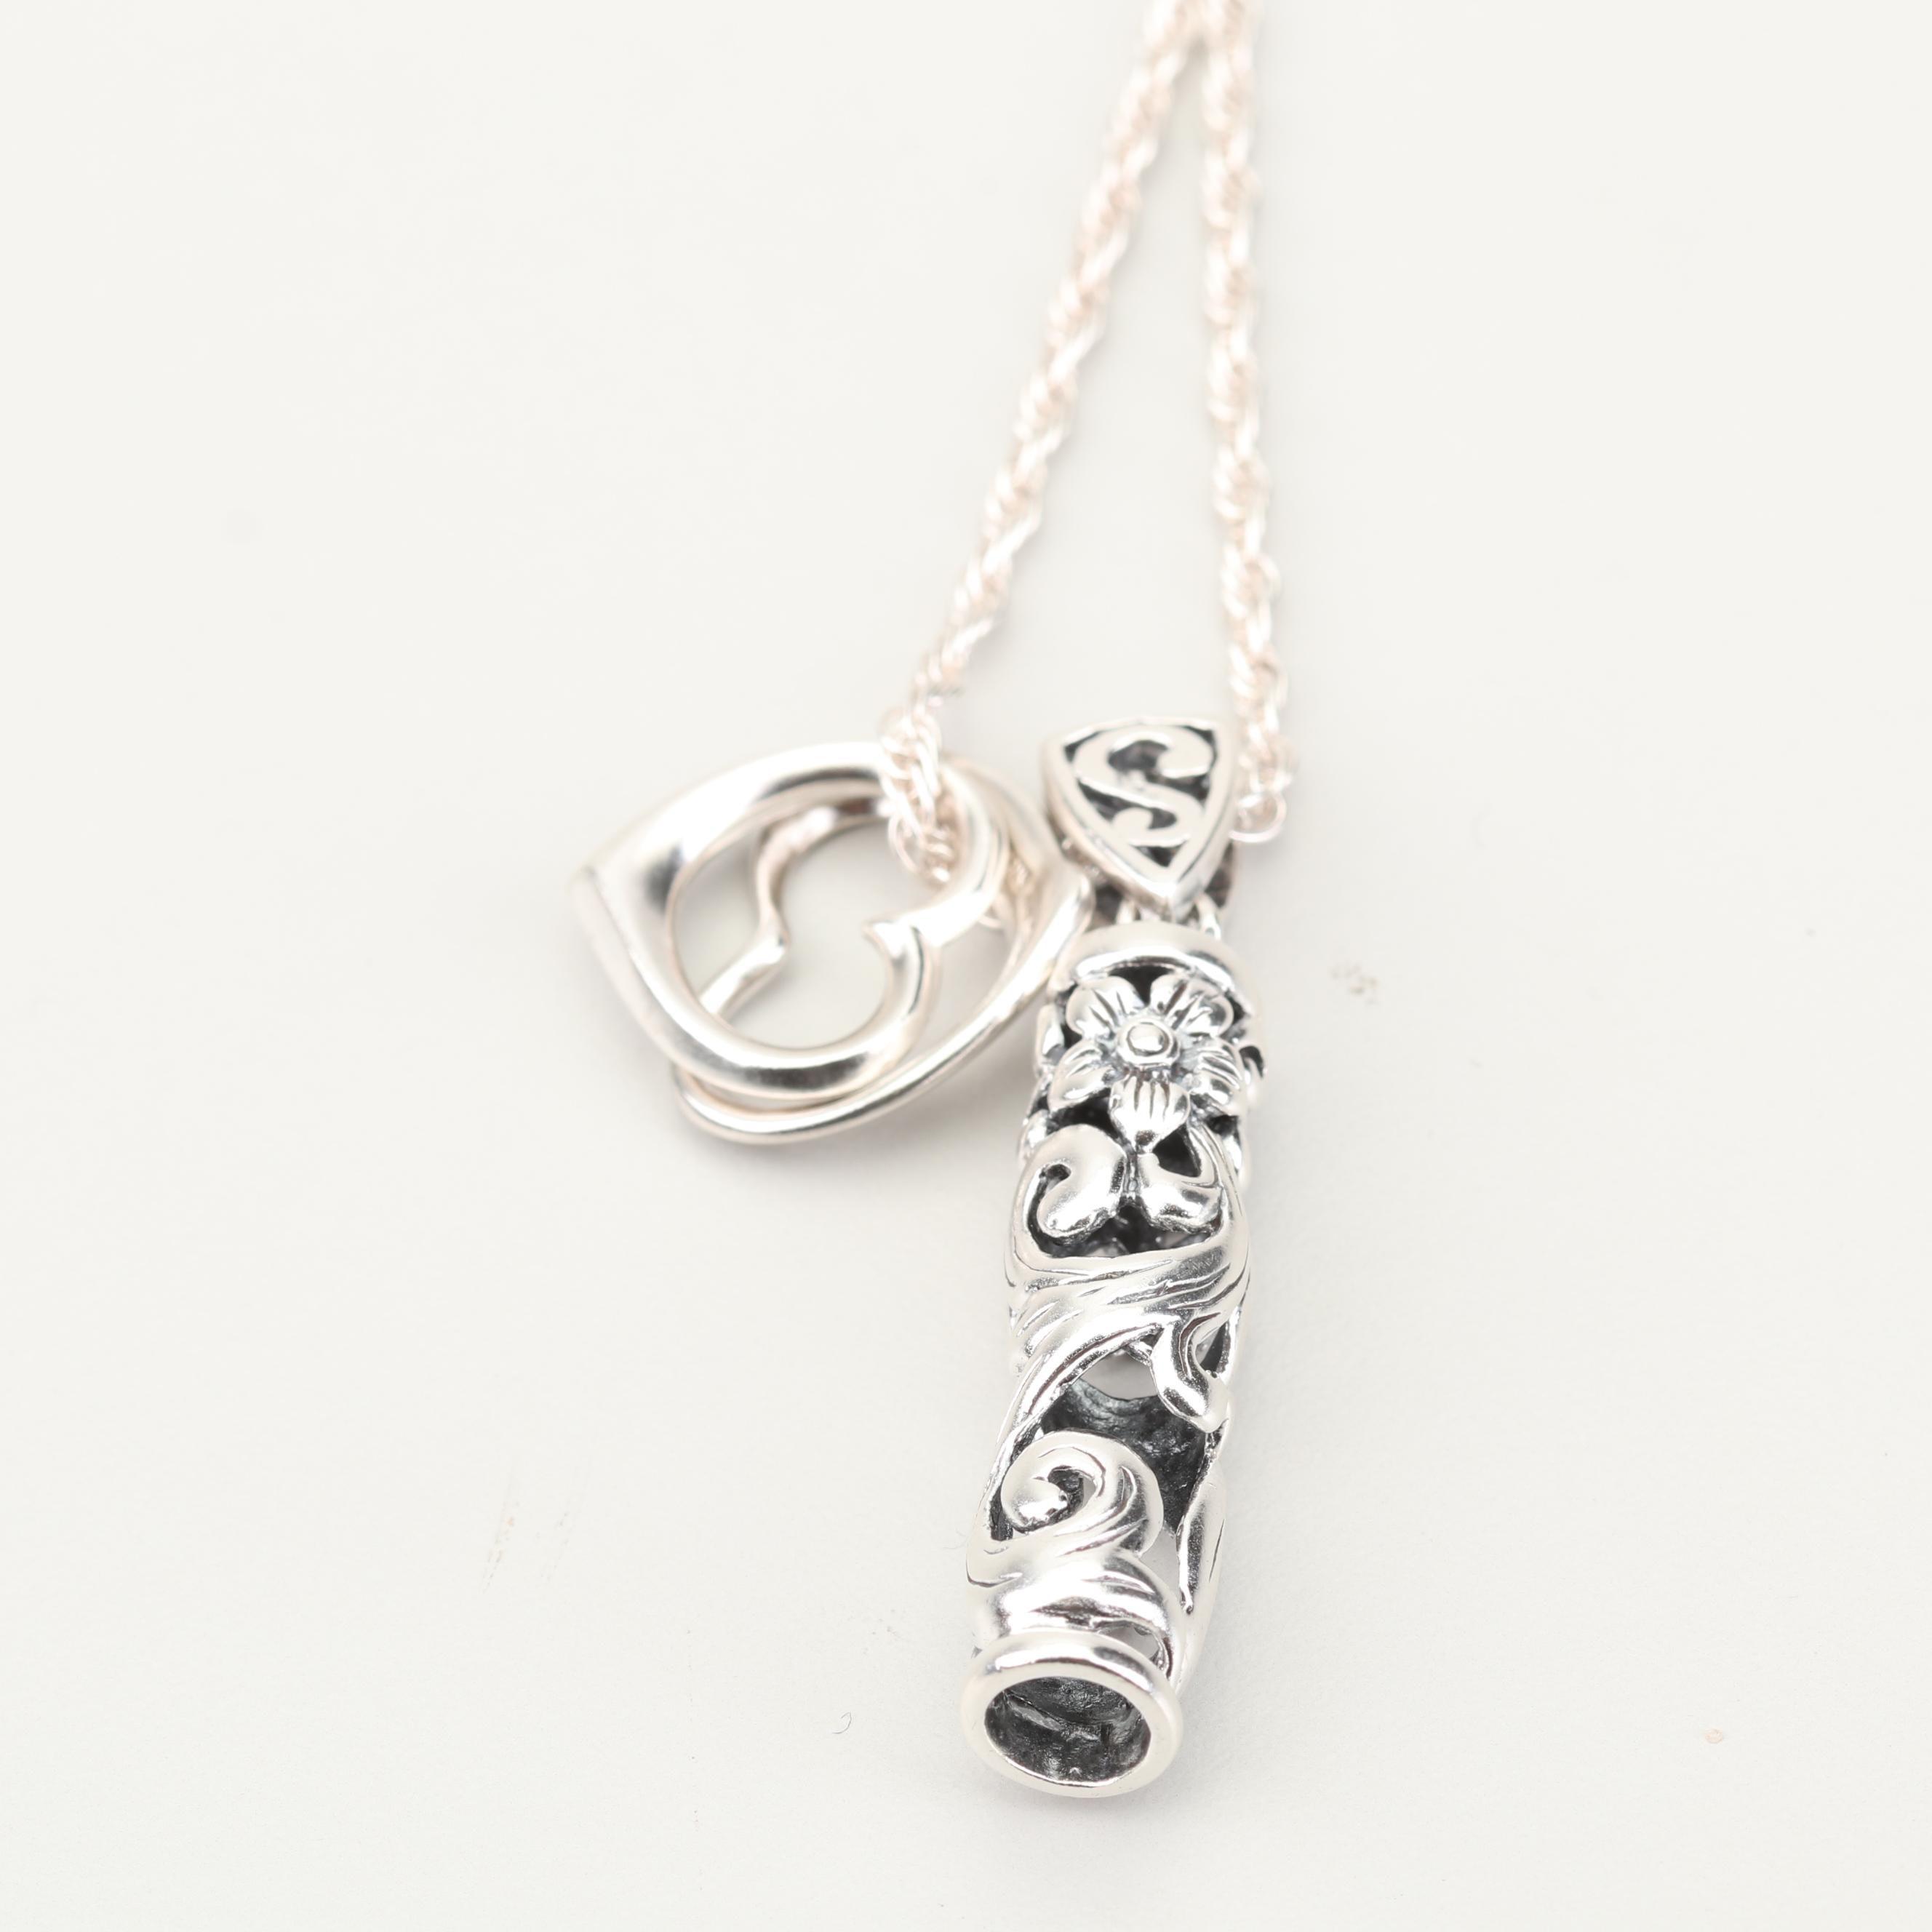 Milor Sterling Silver Pendant Necklace